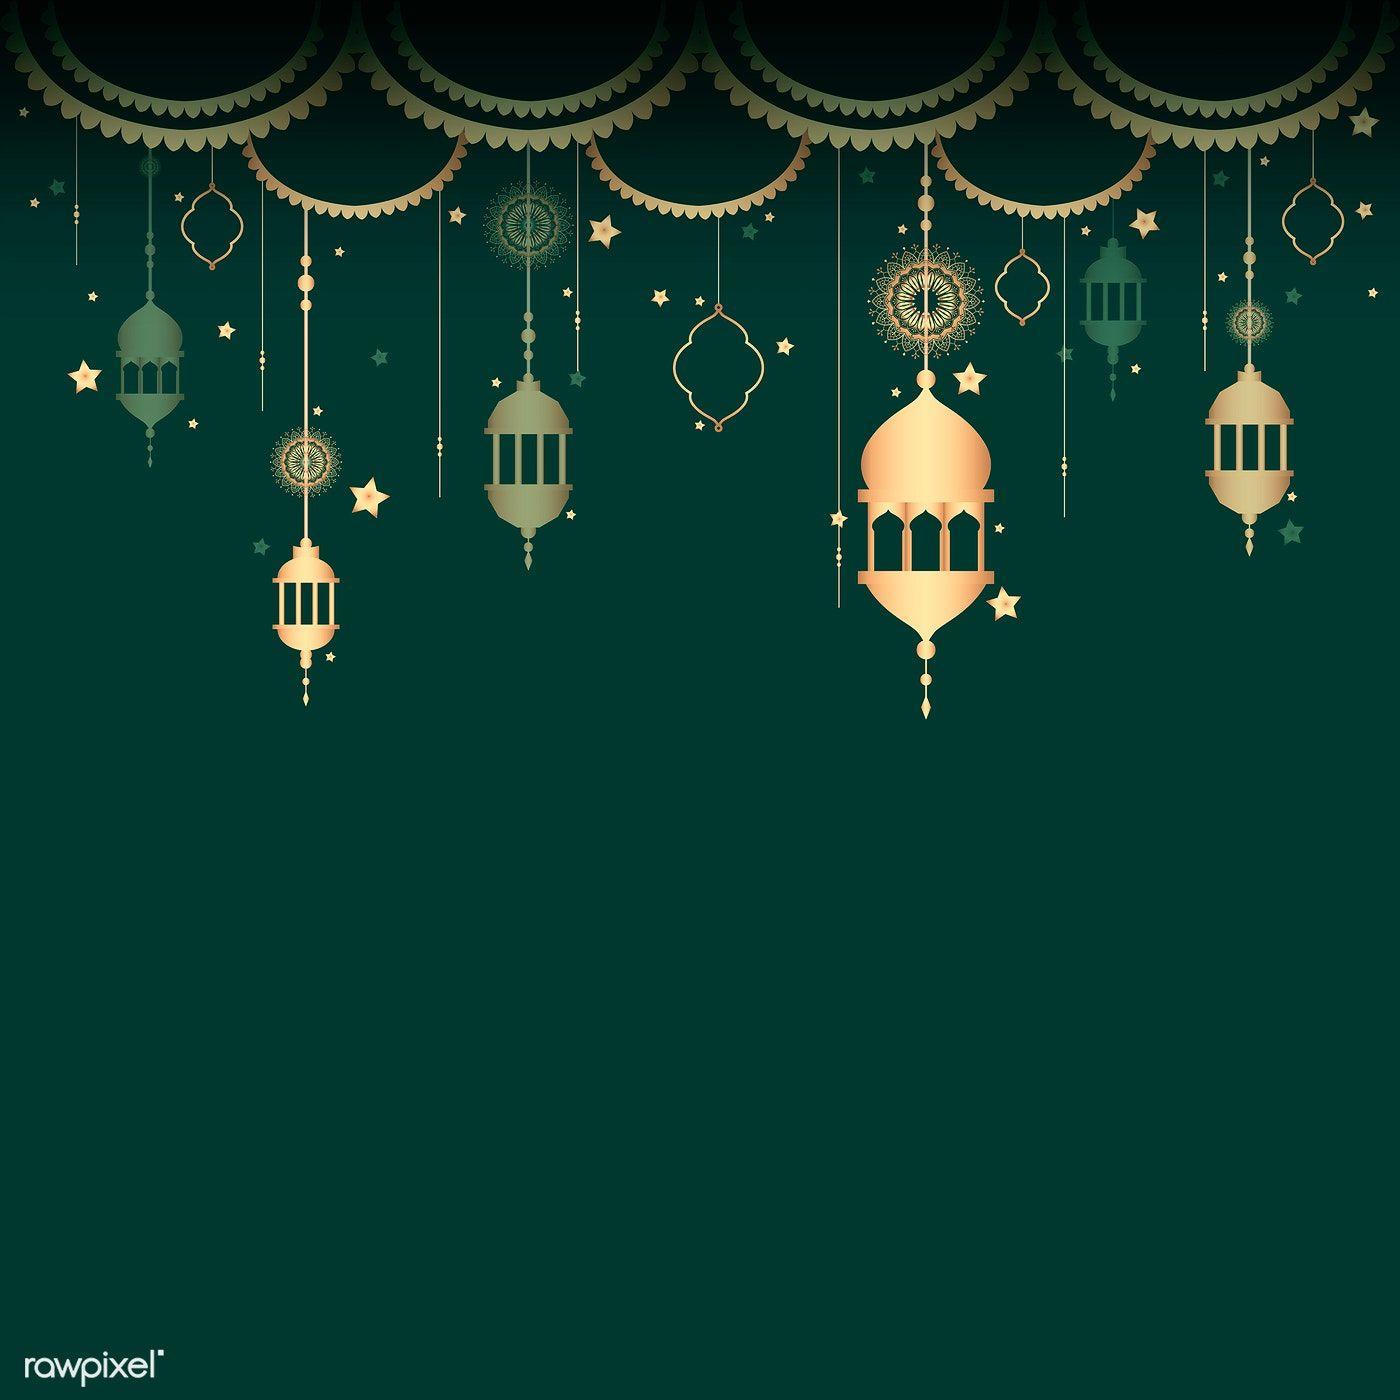 Download Premium Vector Of Lantern Pattern A Blank Green Background 555646 Wallpaper Ramadhan Poster Background Design Space Illustration